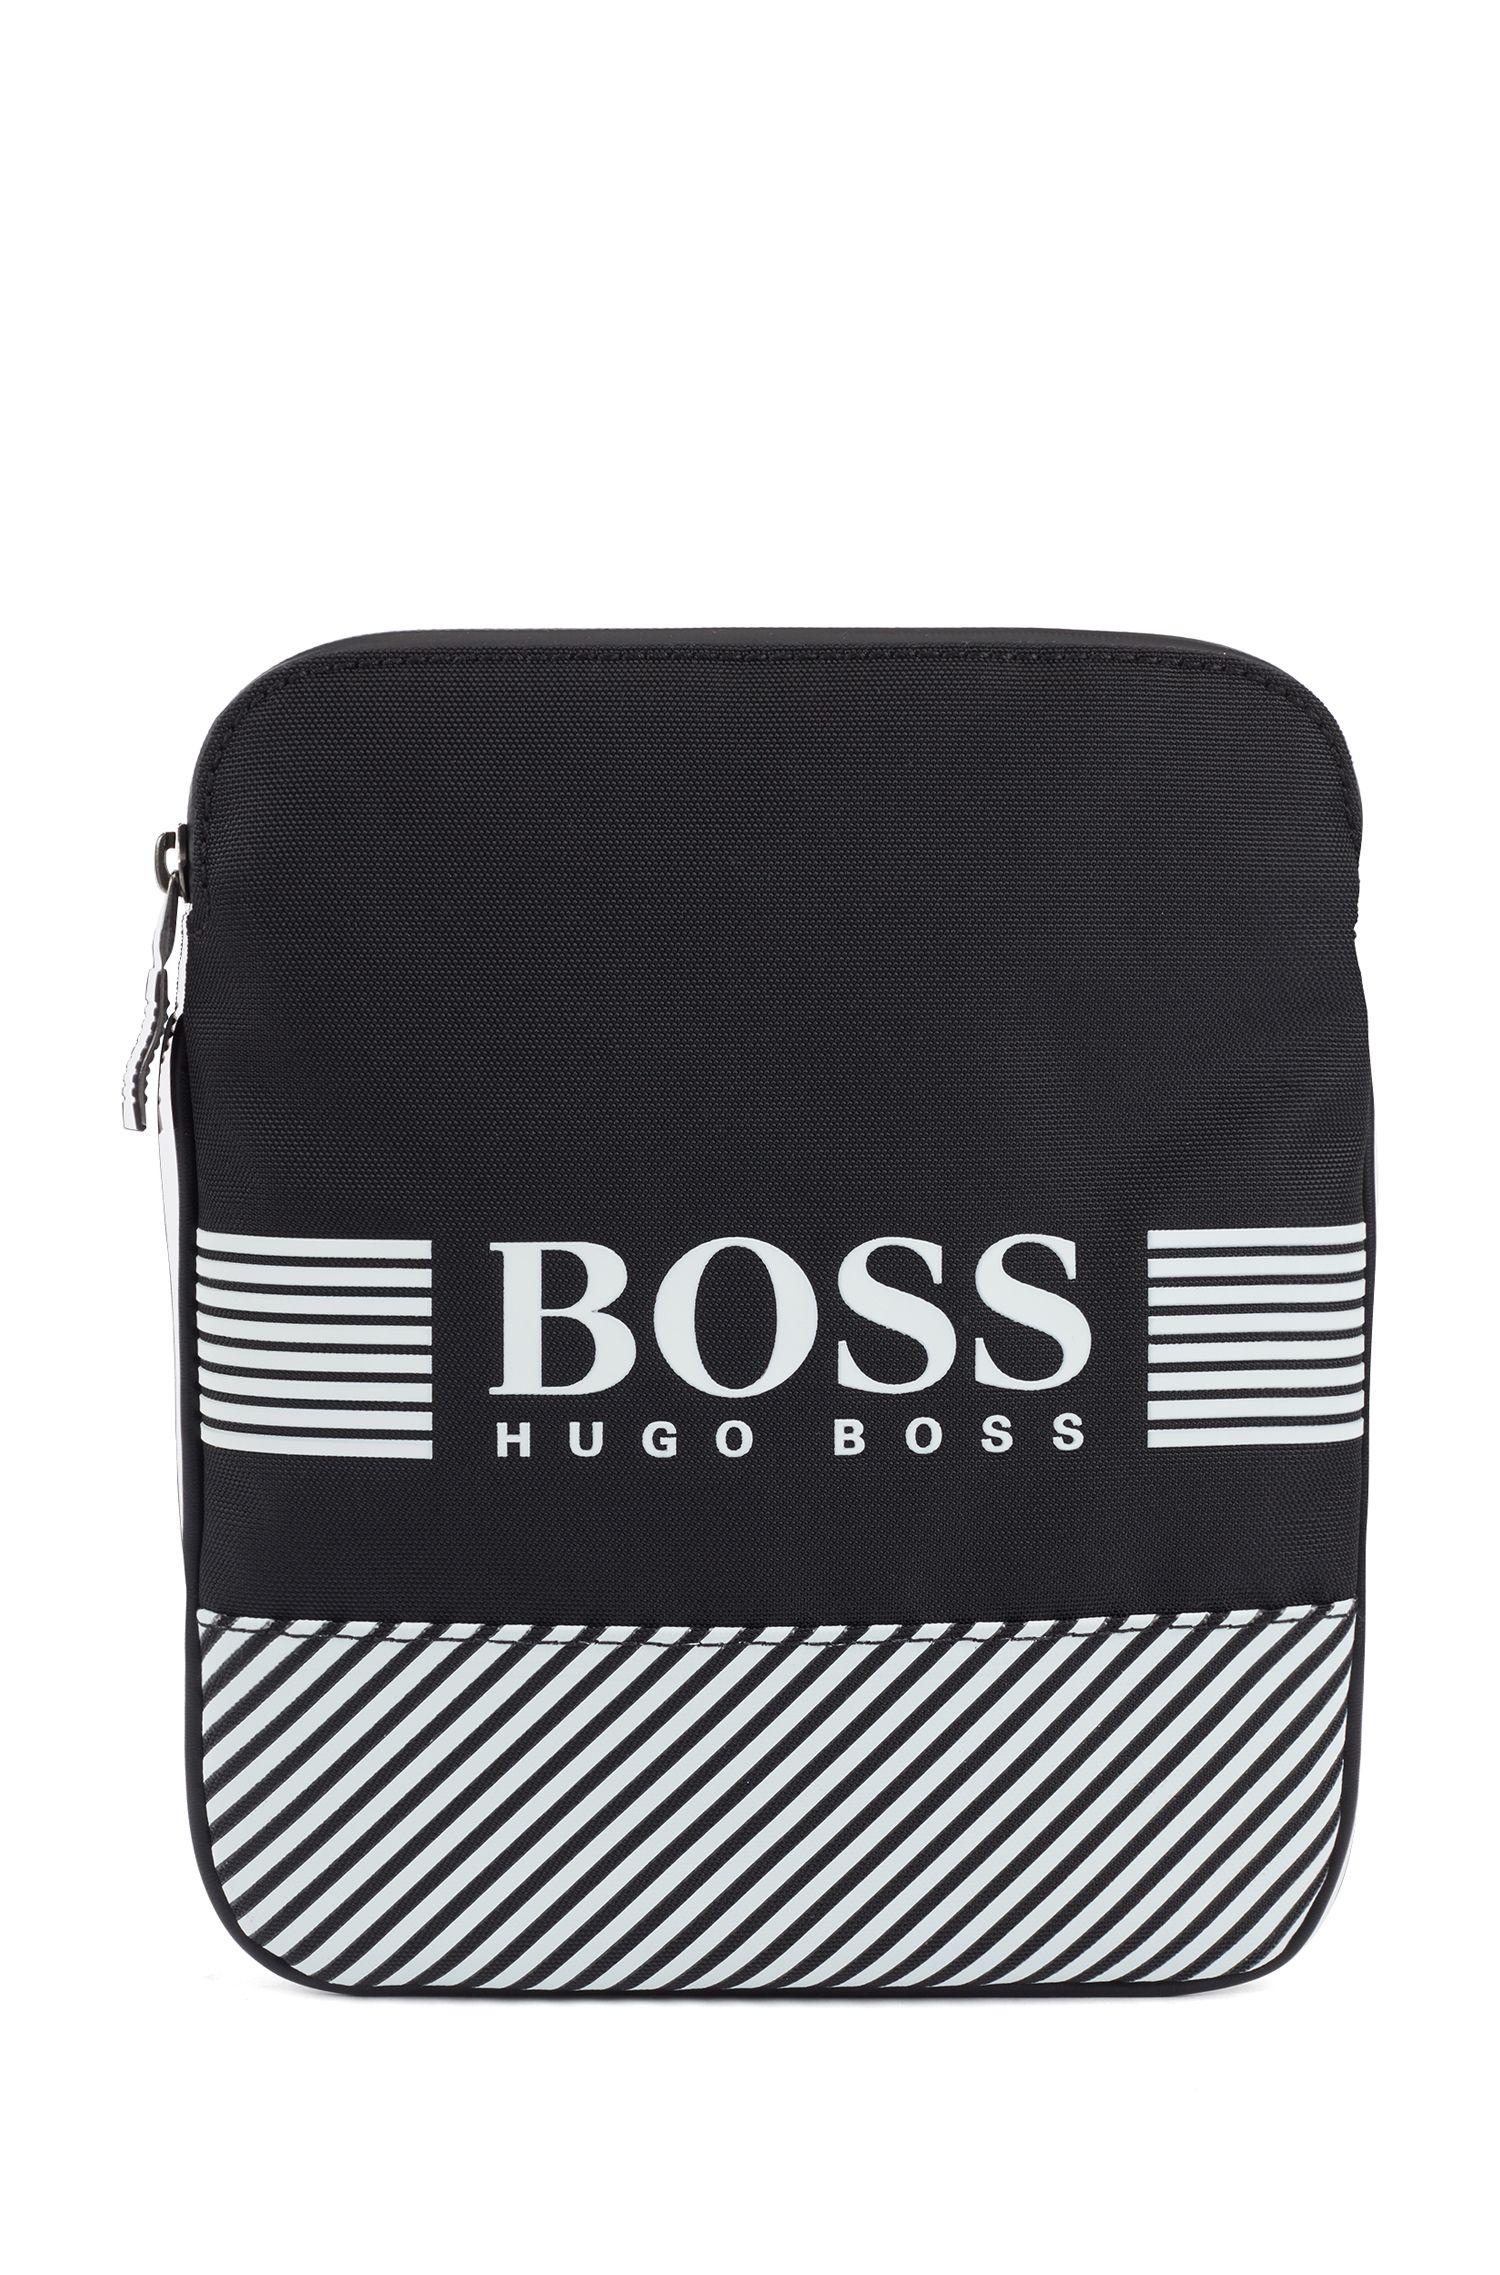 Envelope bag with printed logo and seasonal stripes, Patterned